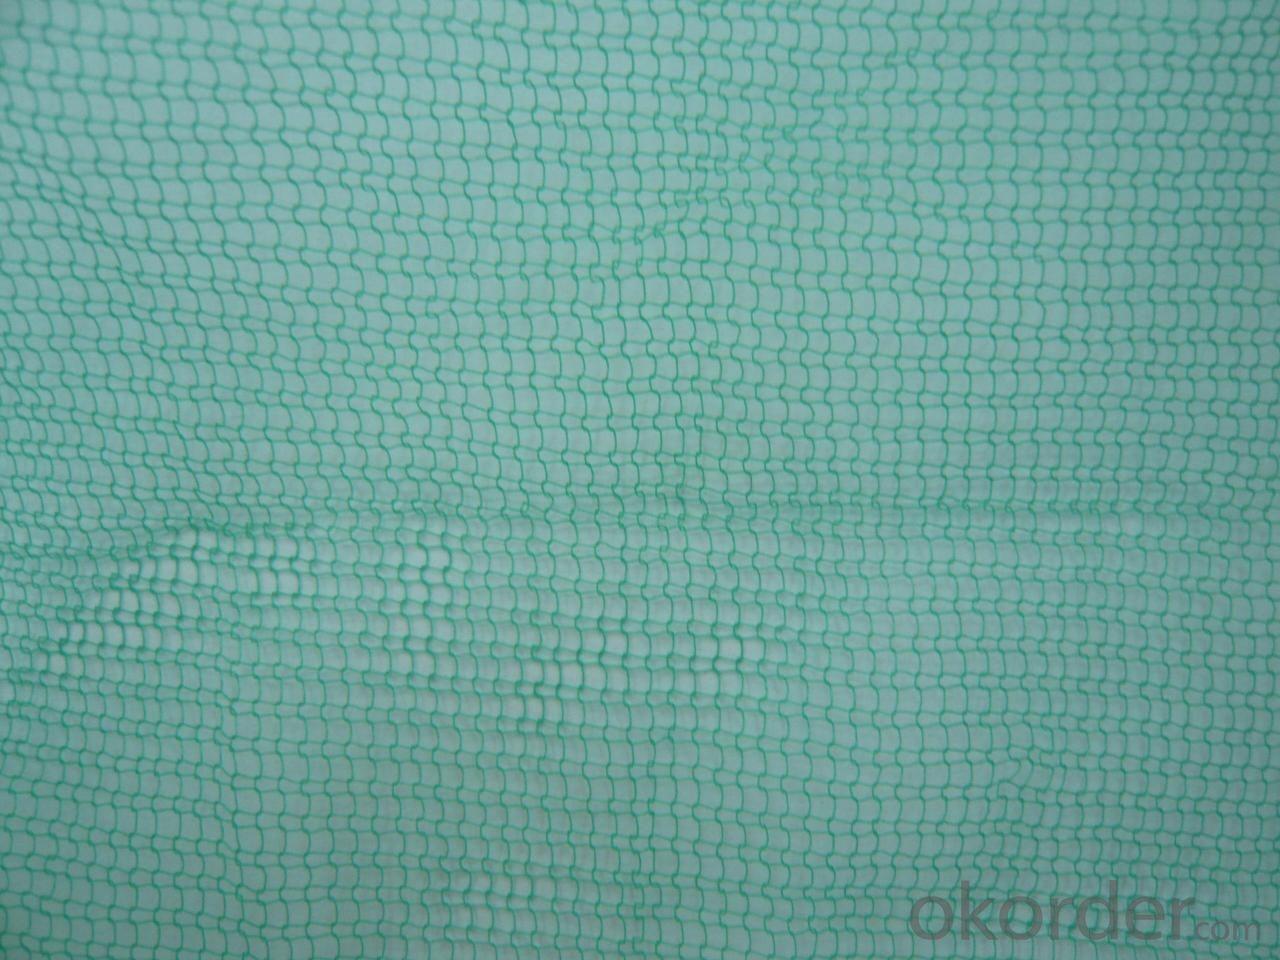 HDPE Mono Mesh Date bag Monofilament 80g